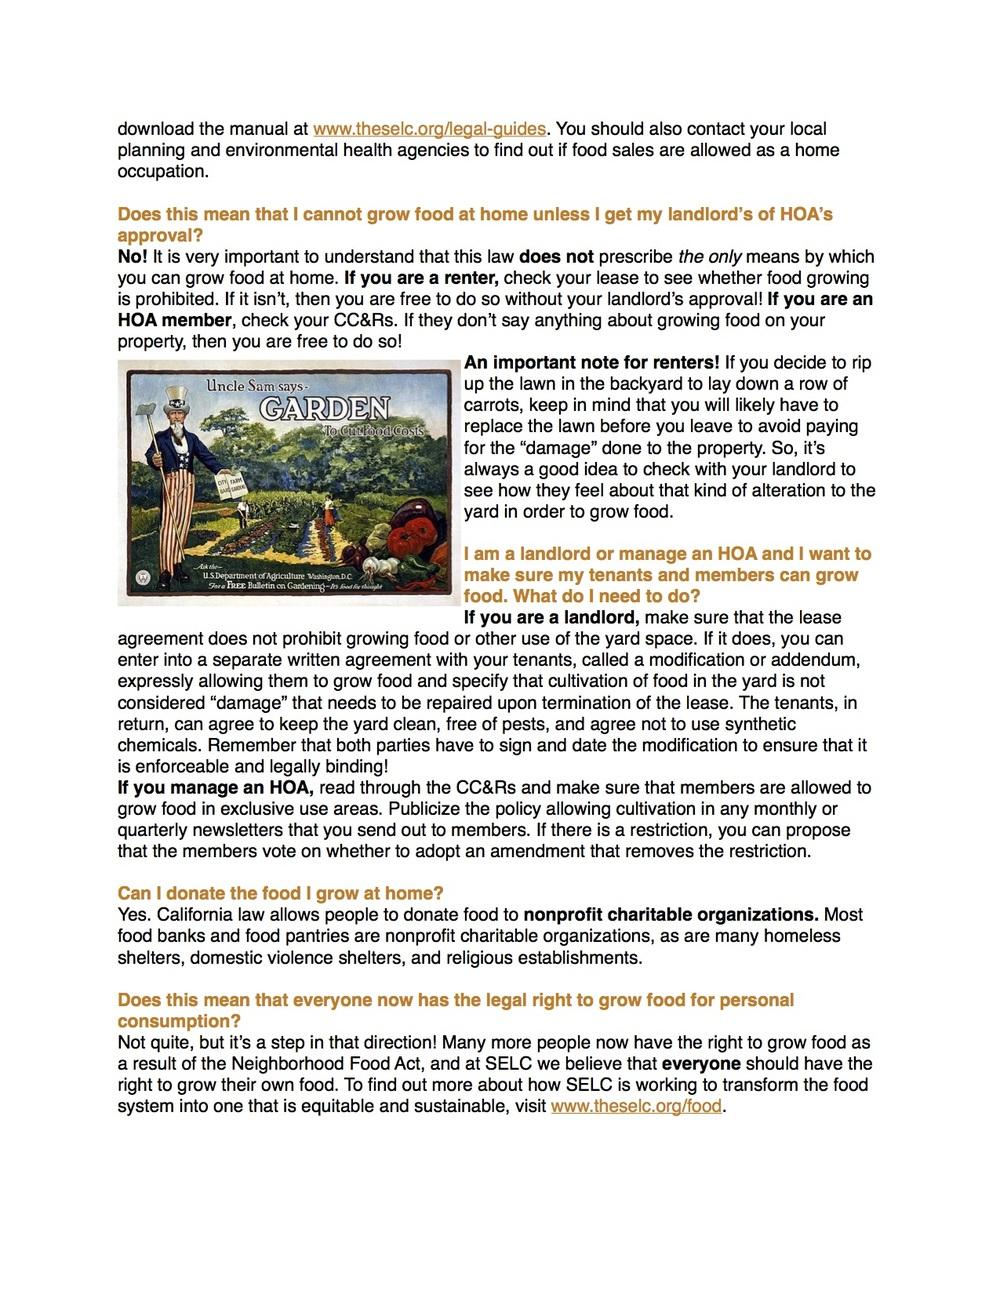 Neighborhood Food Act FAQ